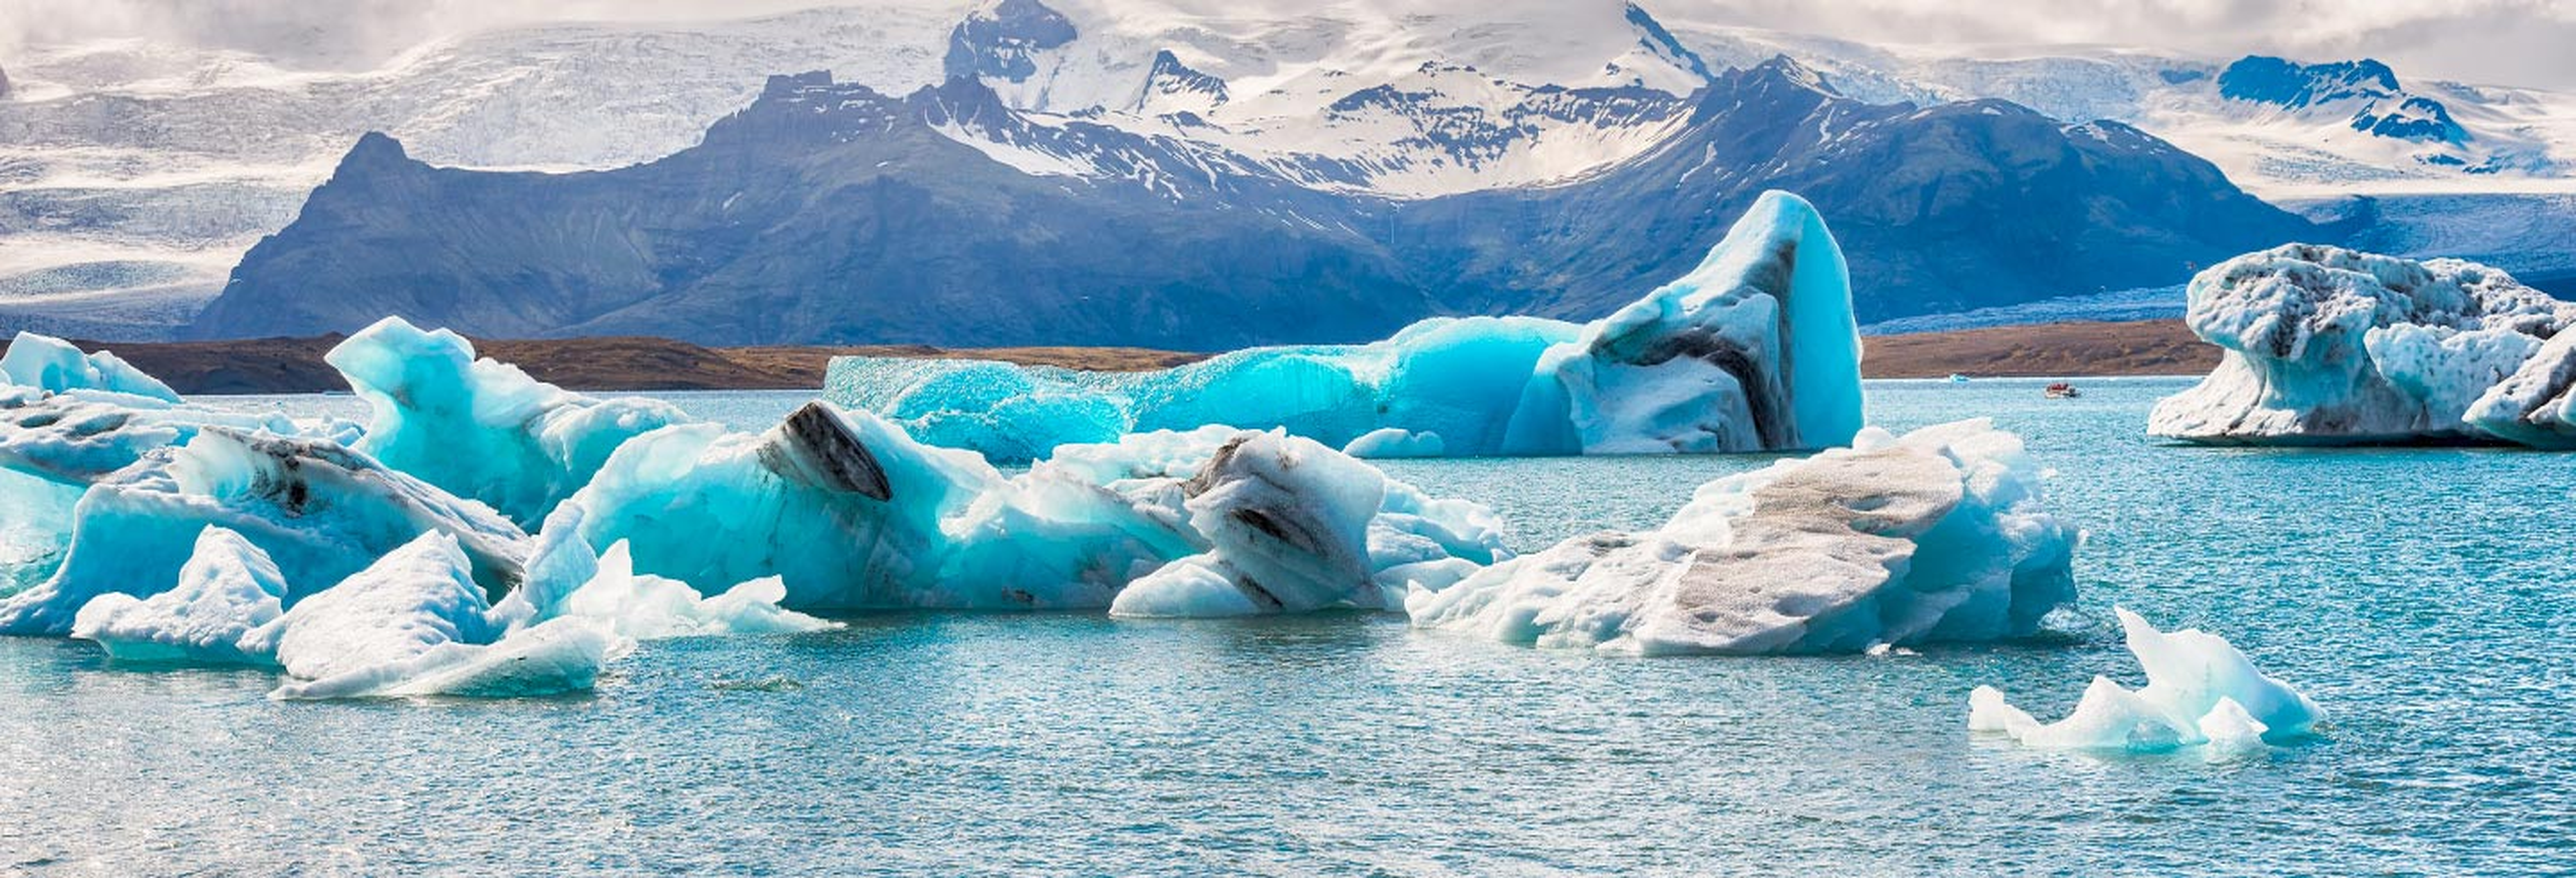 Iceland Glacier Tour: 2 Days